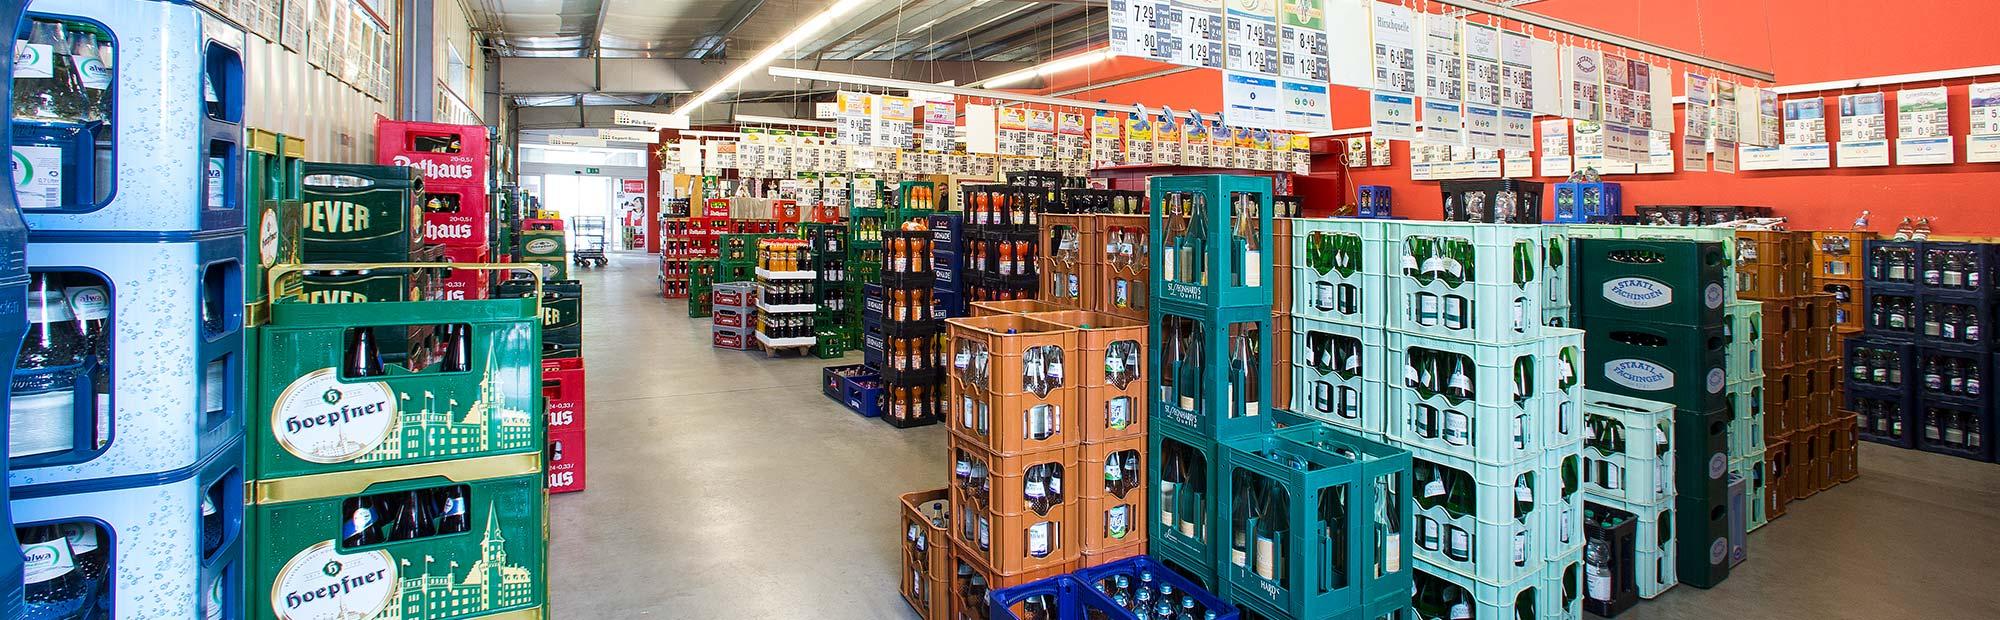 Getränke Volz Pfinztal: Unser Getränke Sortiment